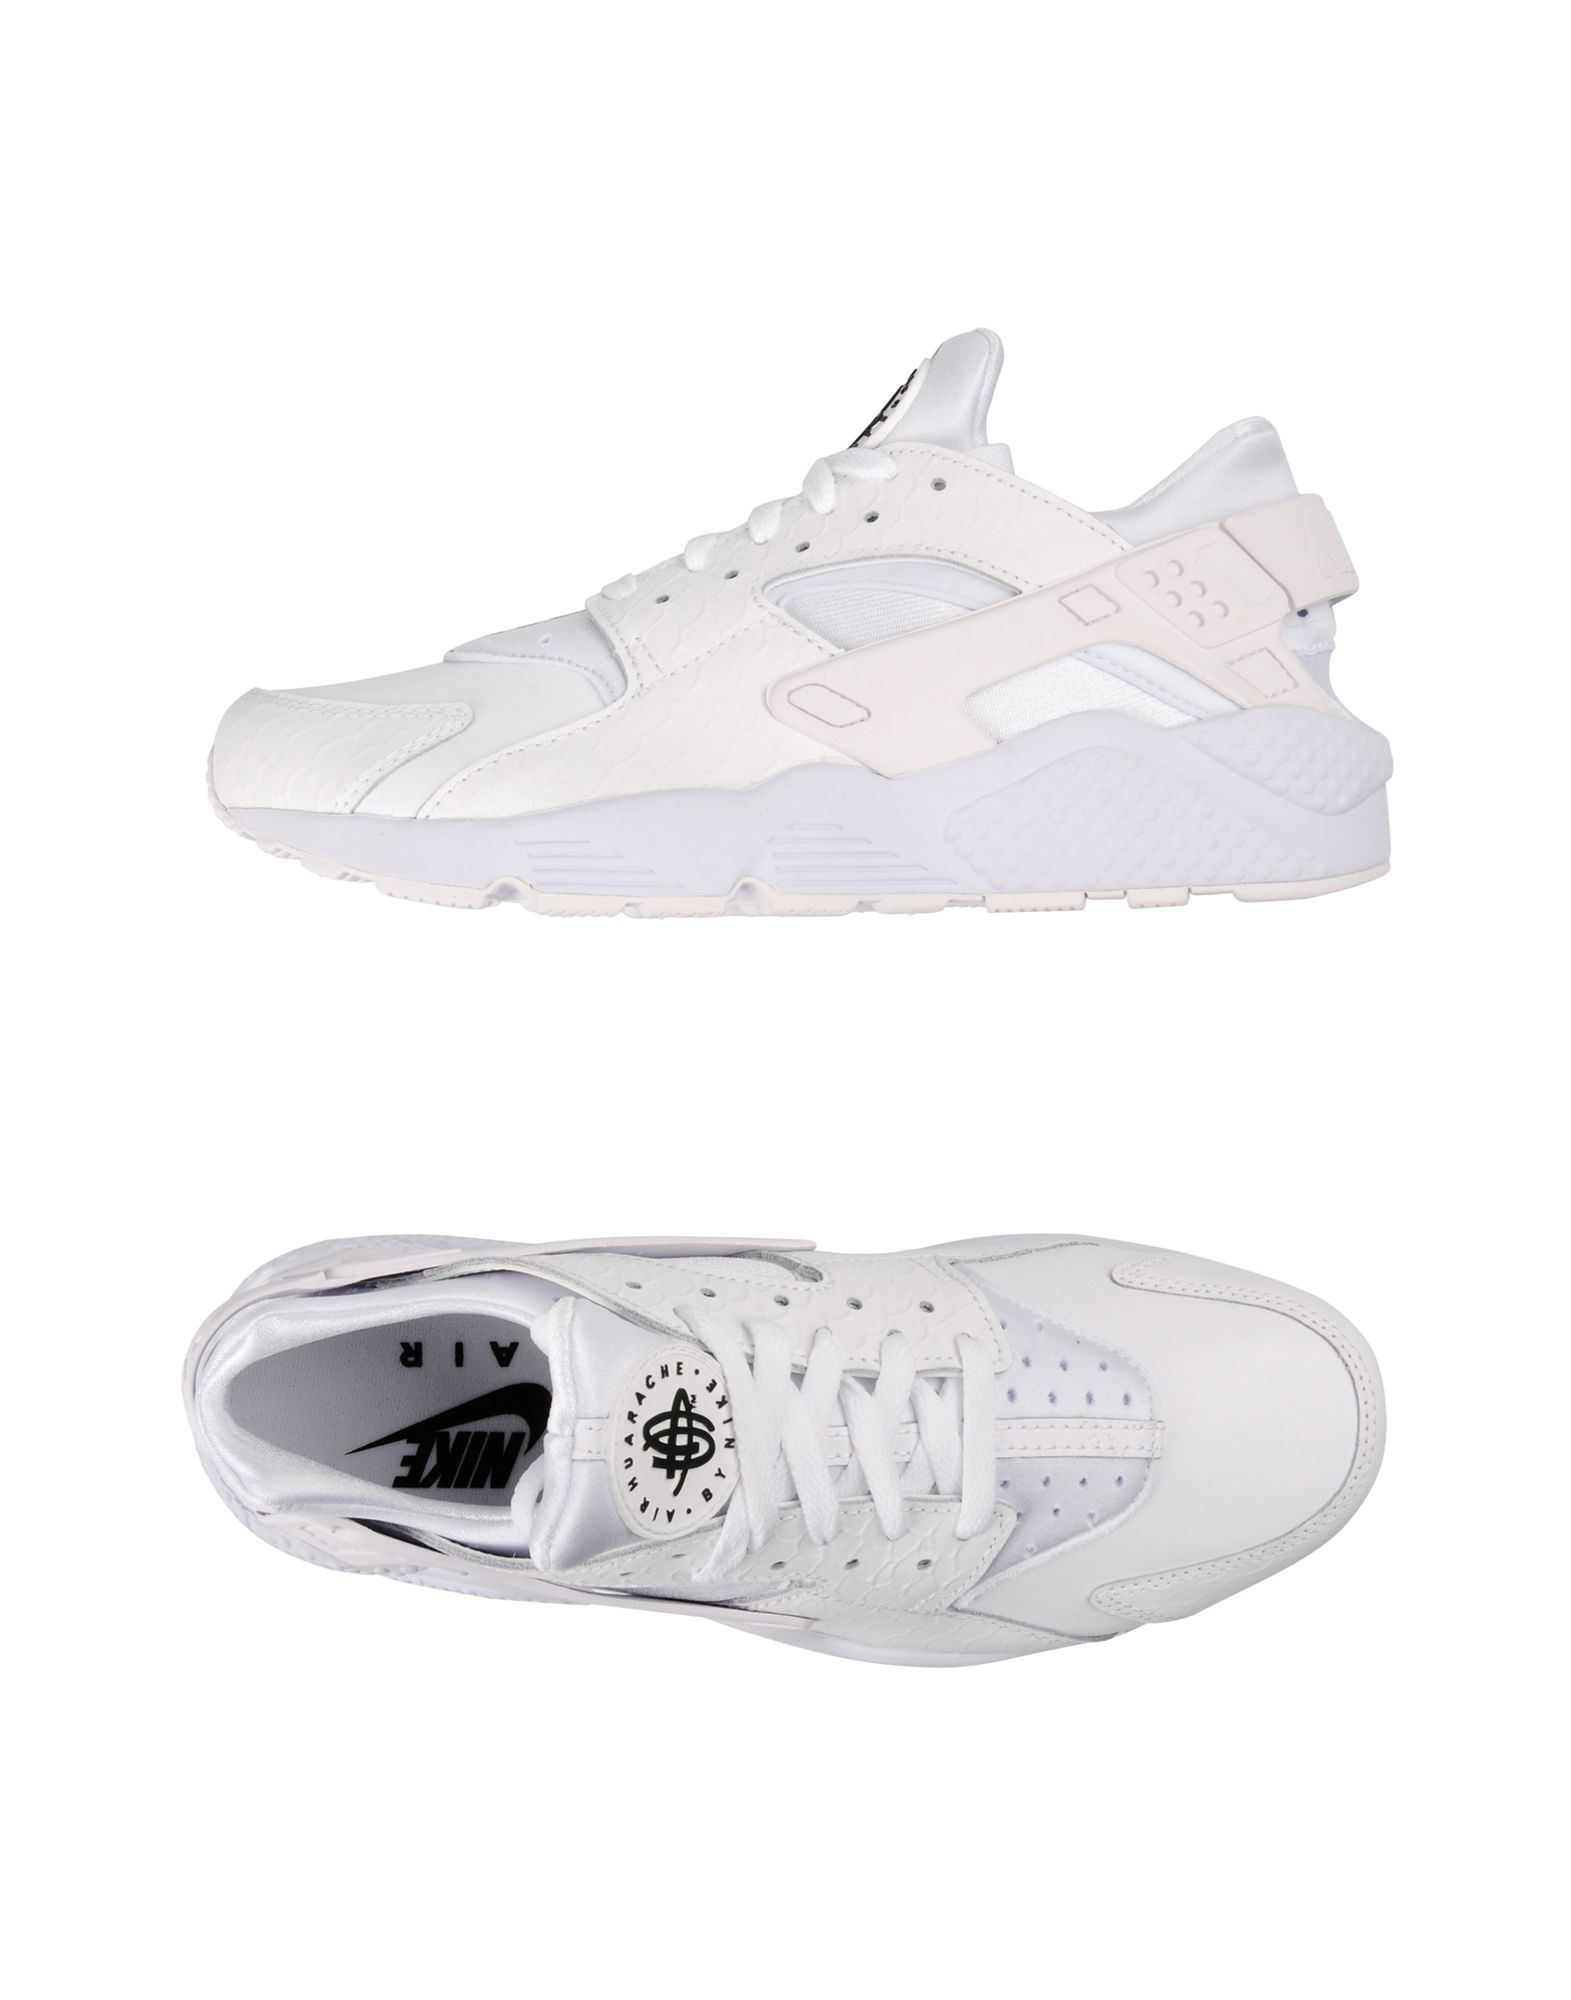 Sneakers Nike Nike Air Huarache Run Prm - Homme - Sneakers Nike sur